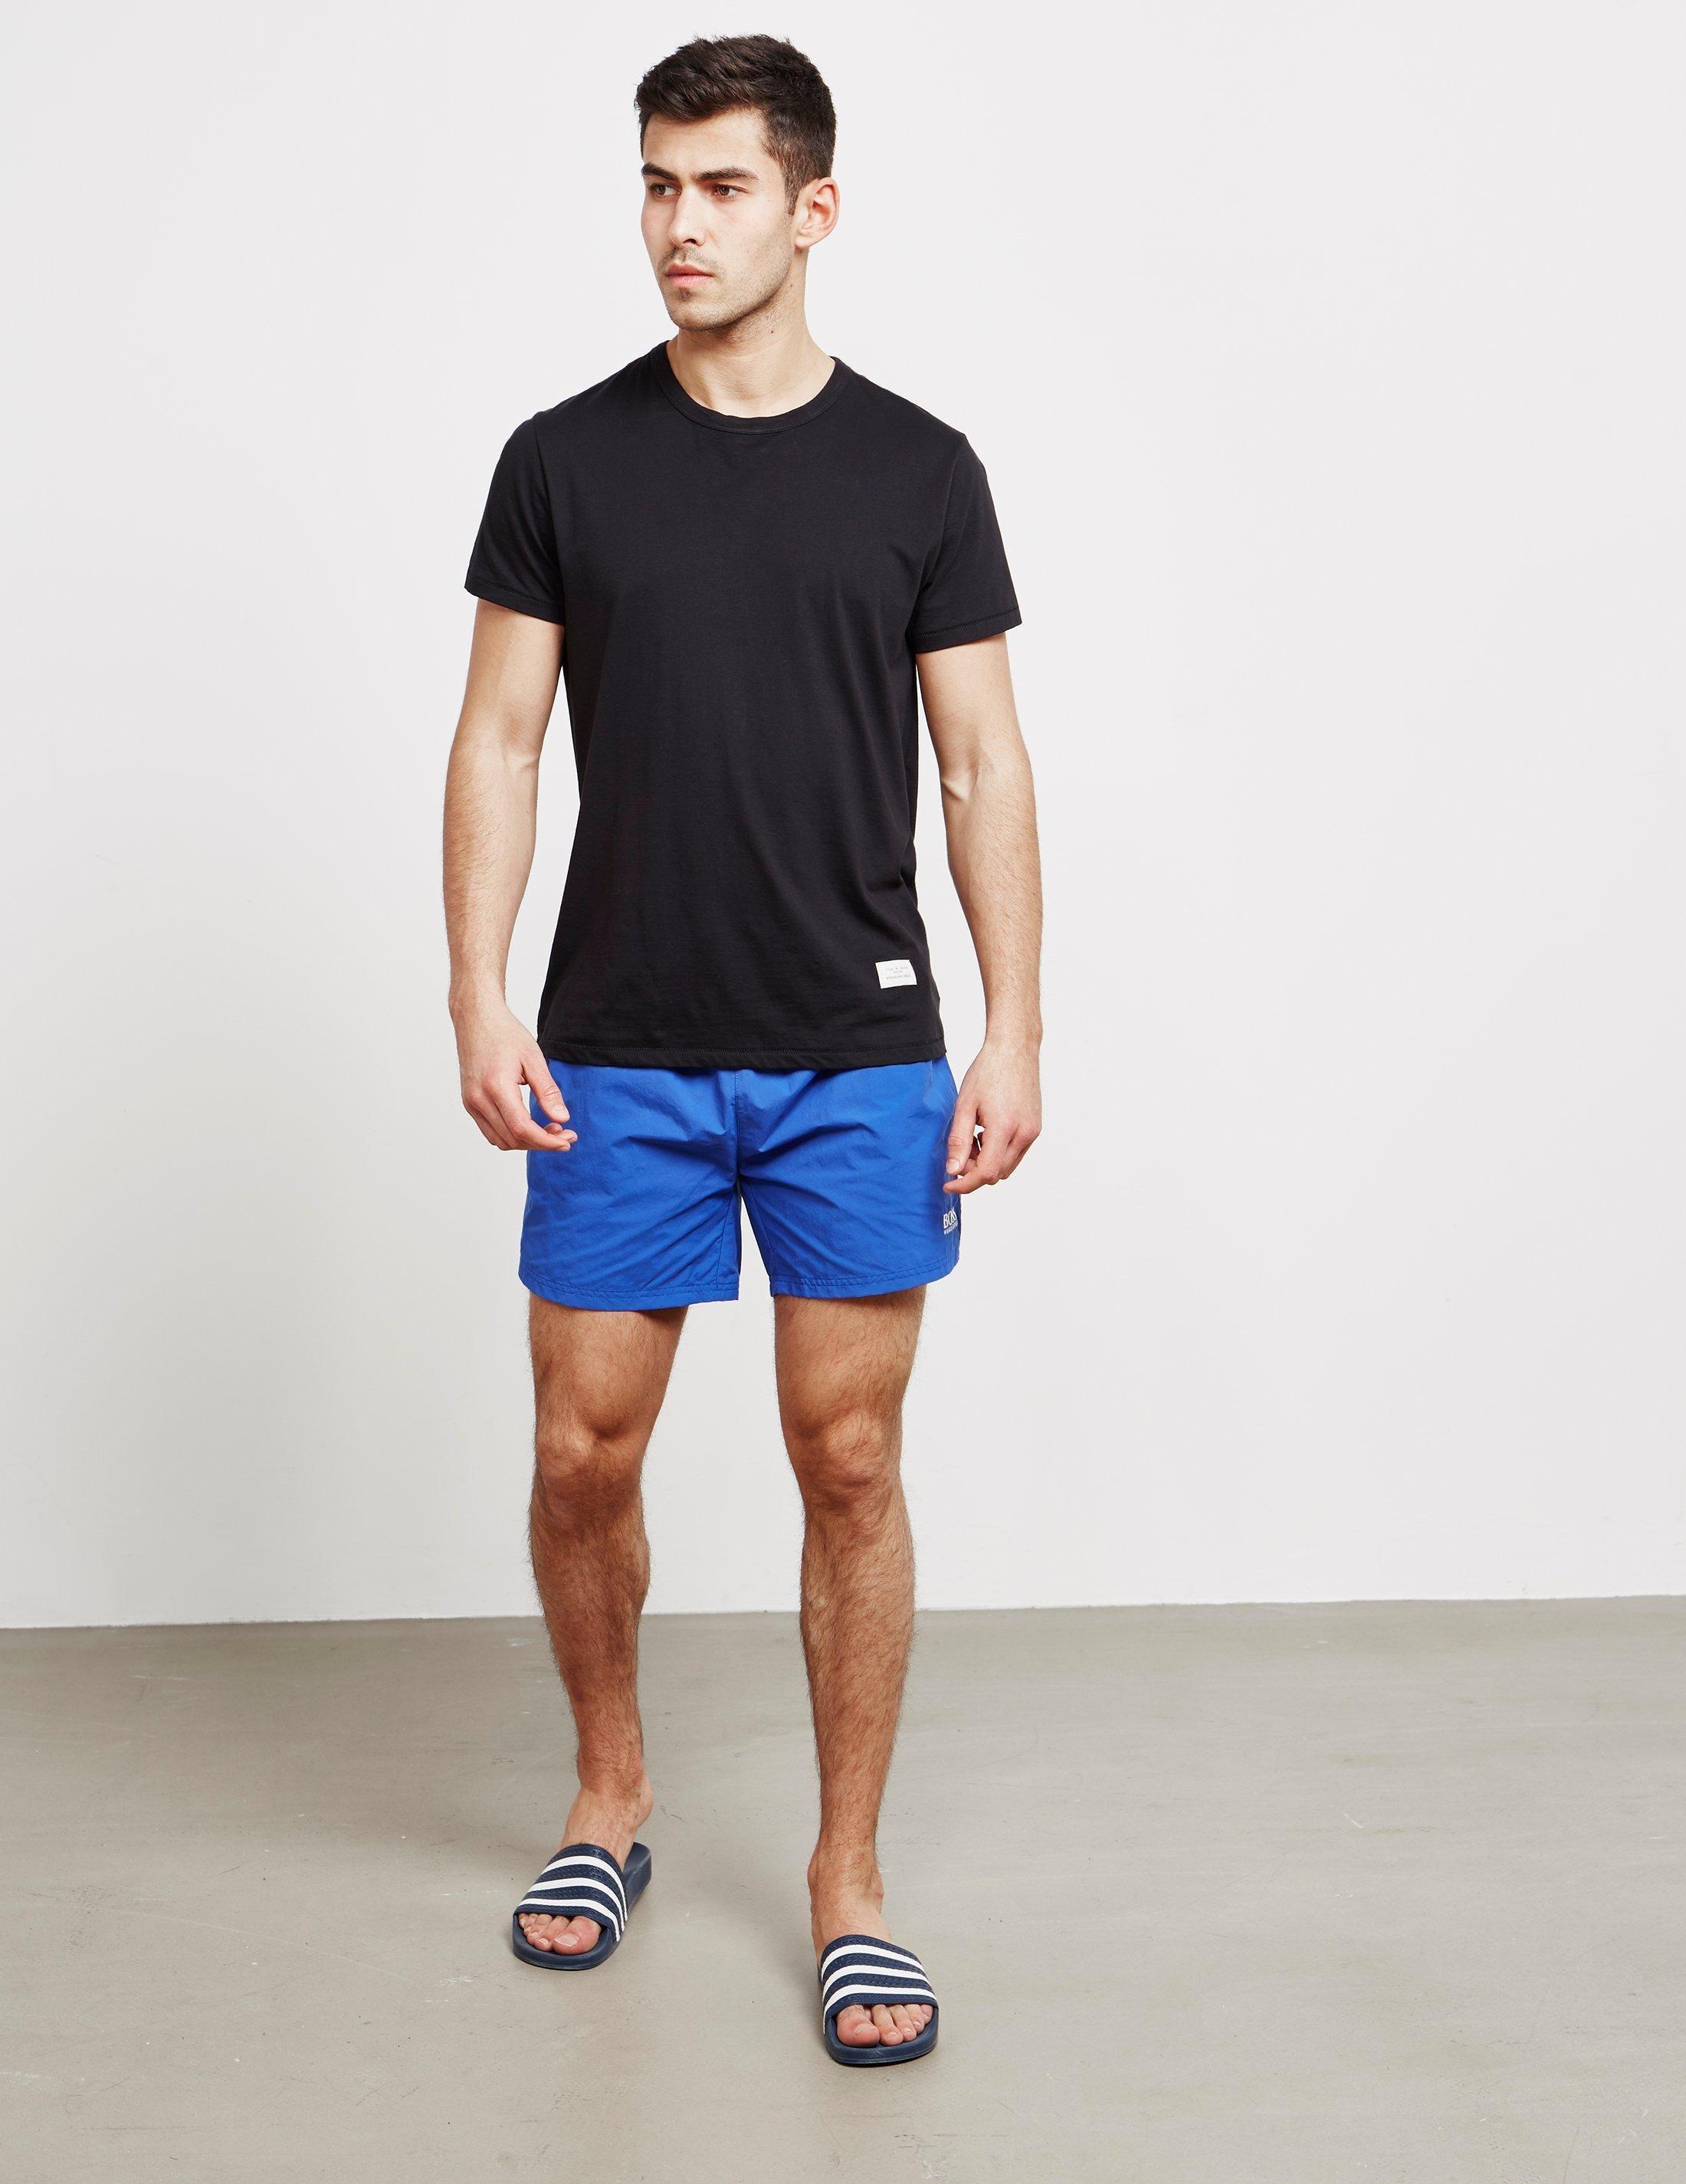 6edcc080b9 BOSS Perch Swim Shorts Blue in Blue for Men - Lyst